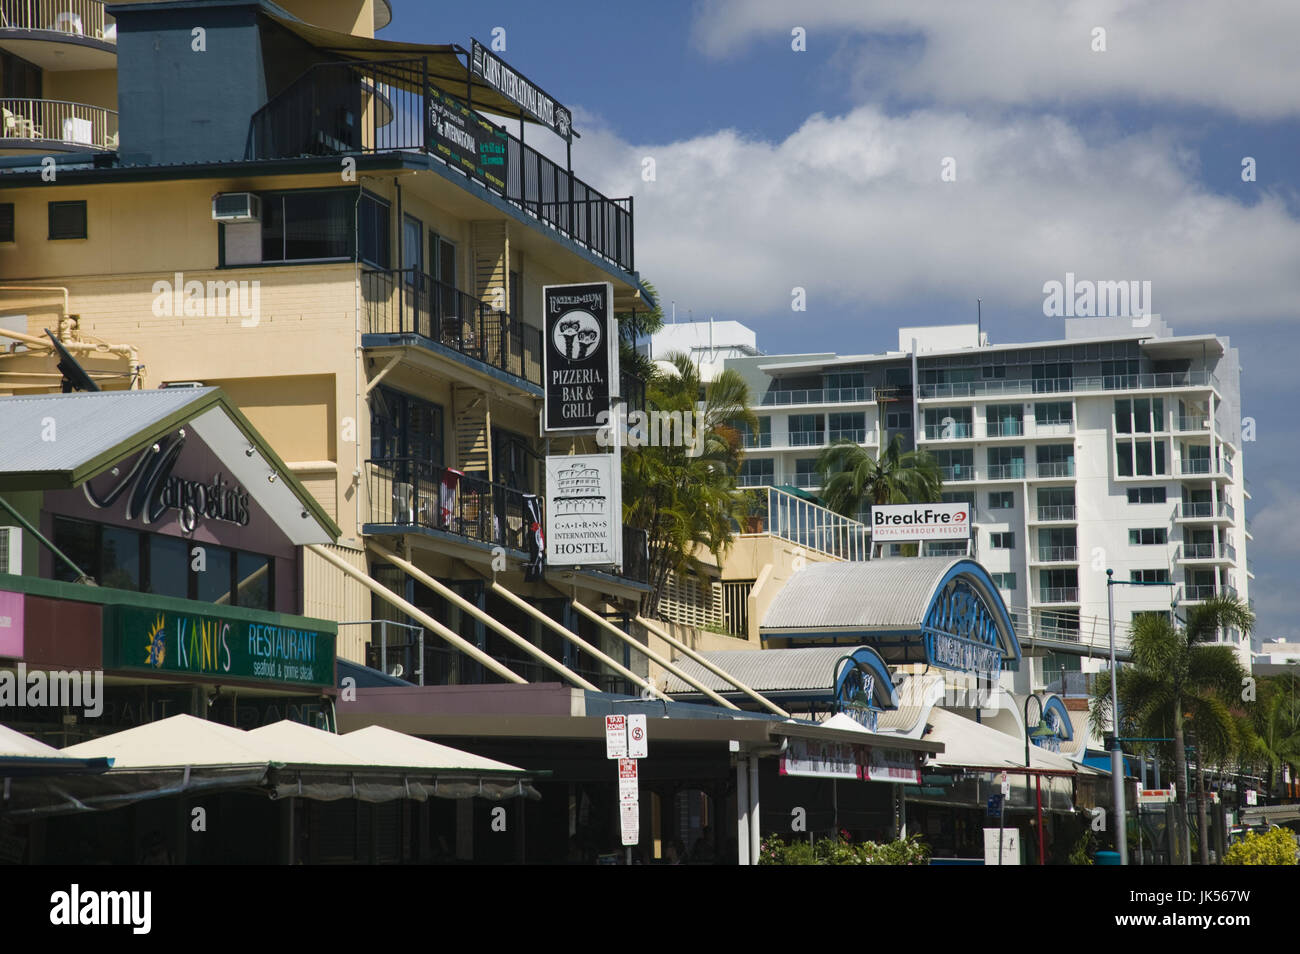 Australia, Queensland, North Coast, Cairns, Buildings along the Esplanade, Stock Photo